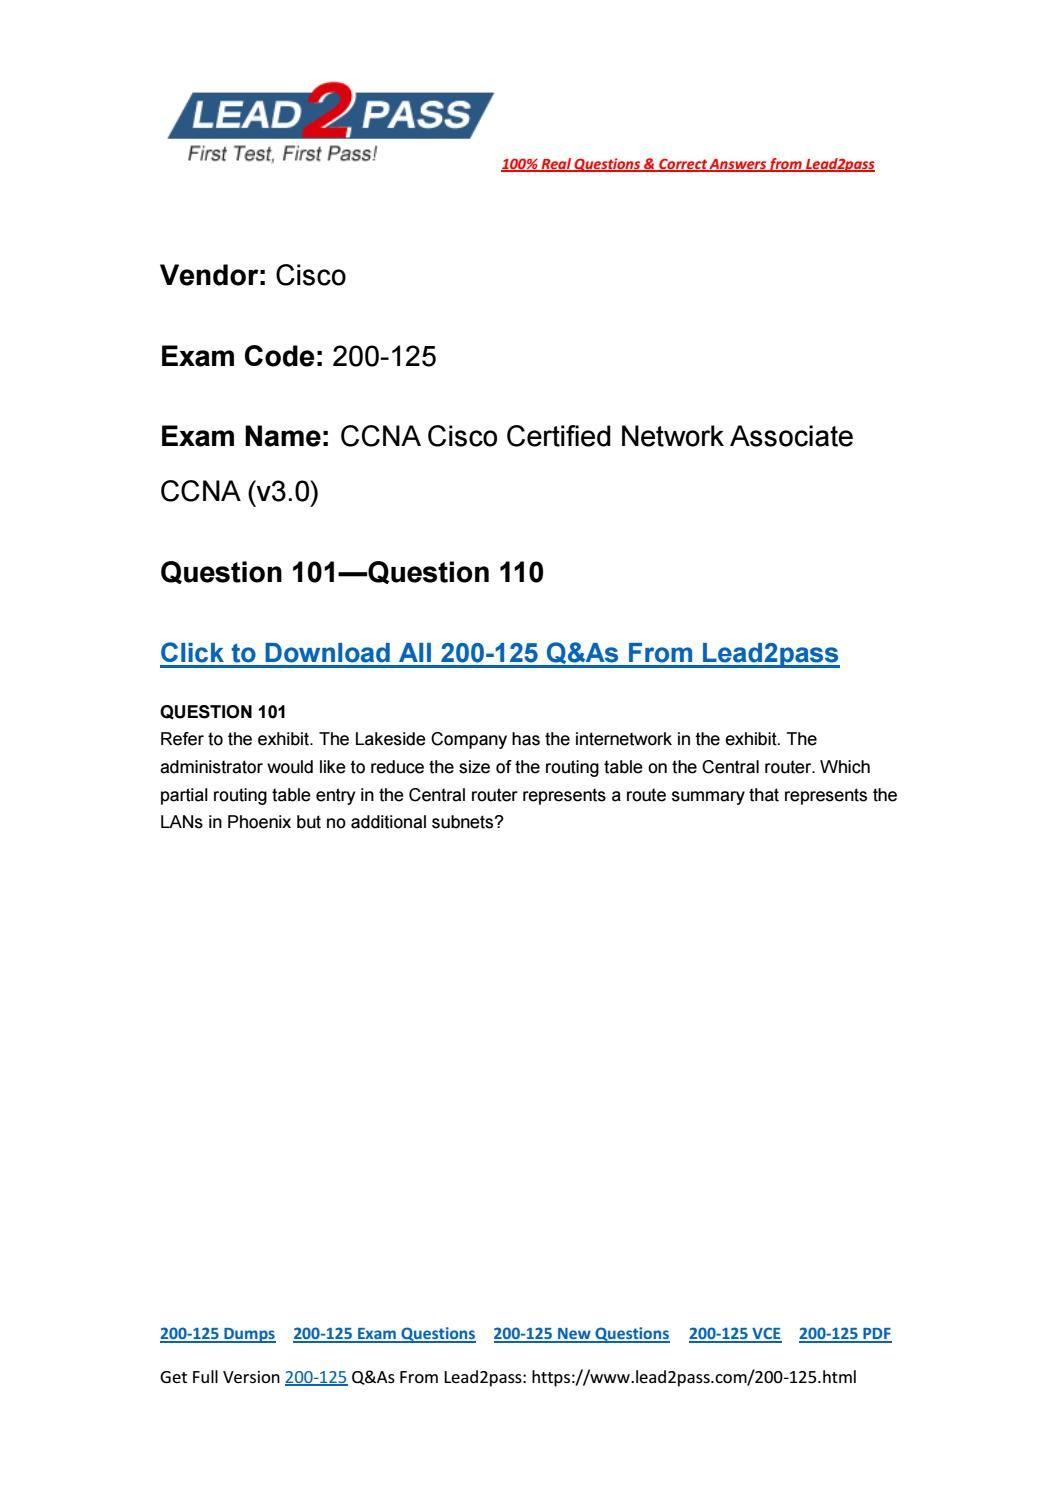 Free Lead2pass 200-125 PDF Download 100% Pass Exam 200-125